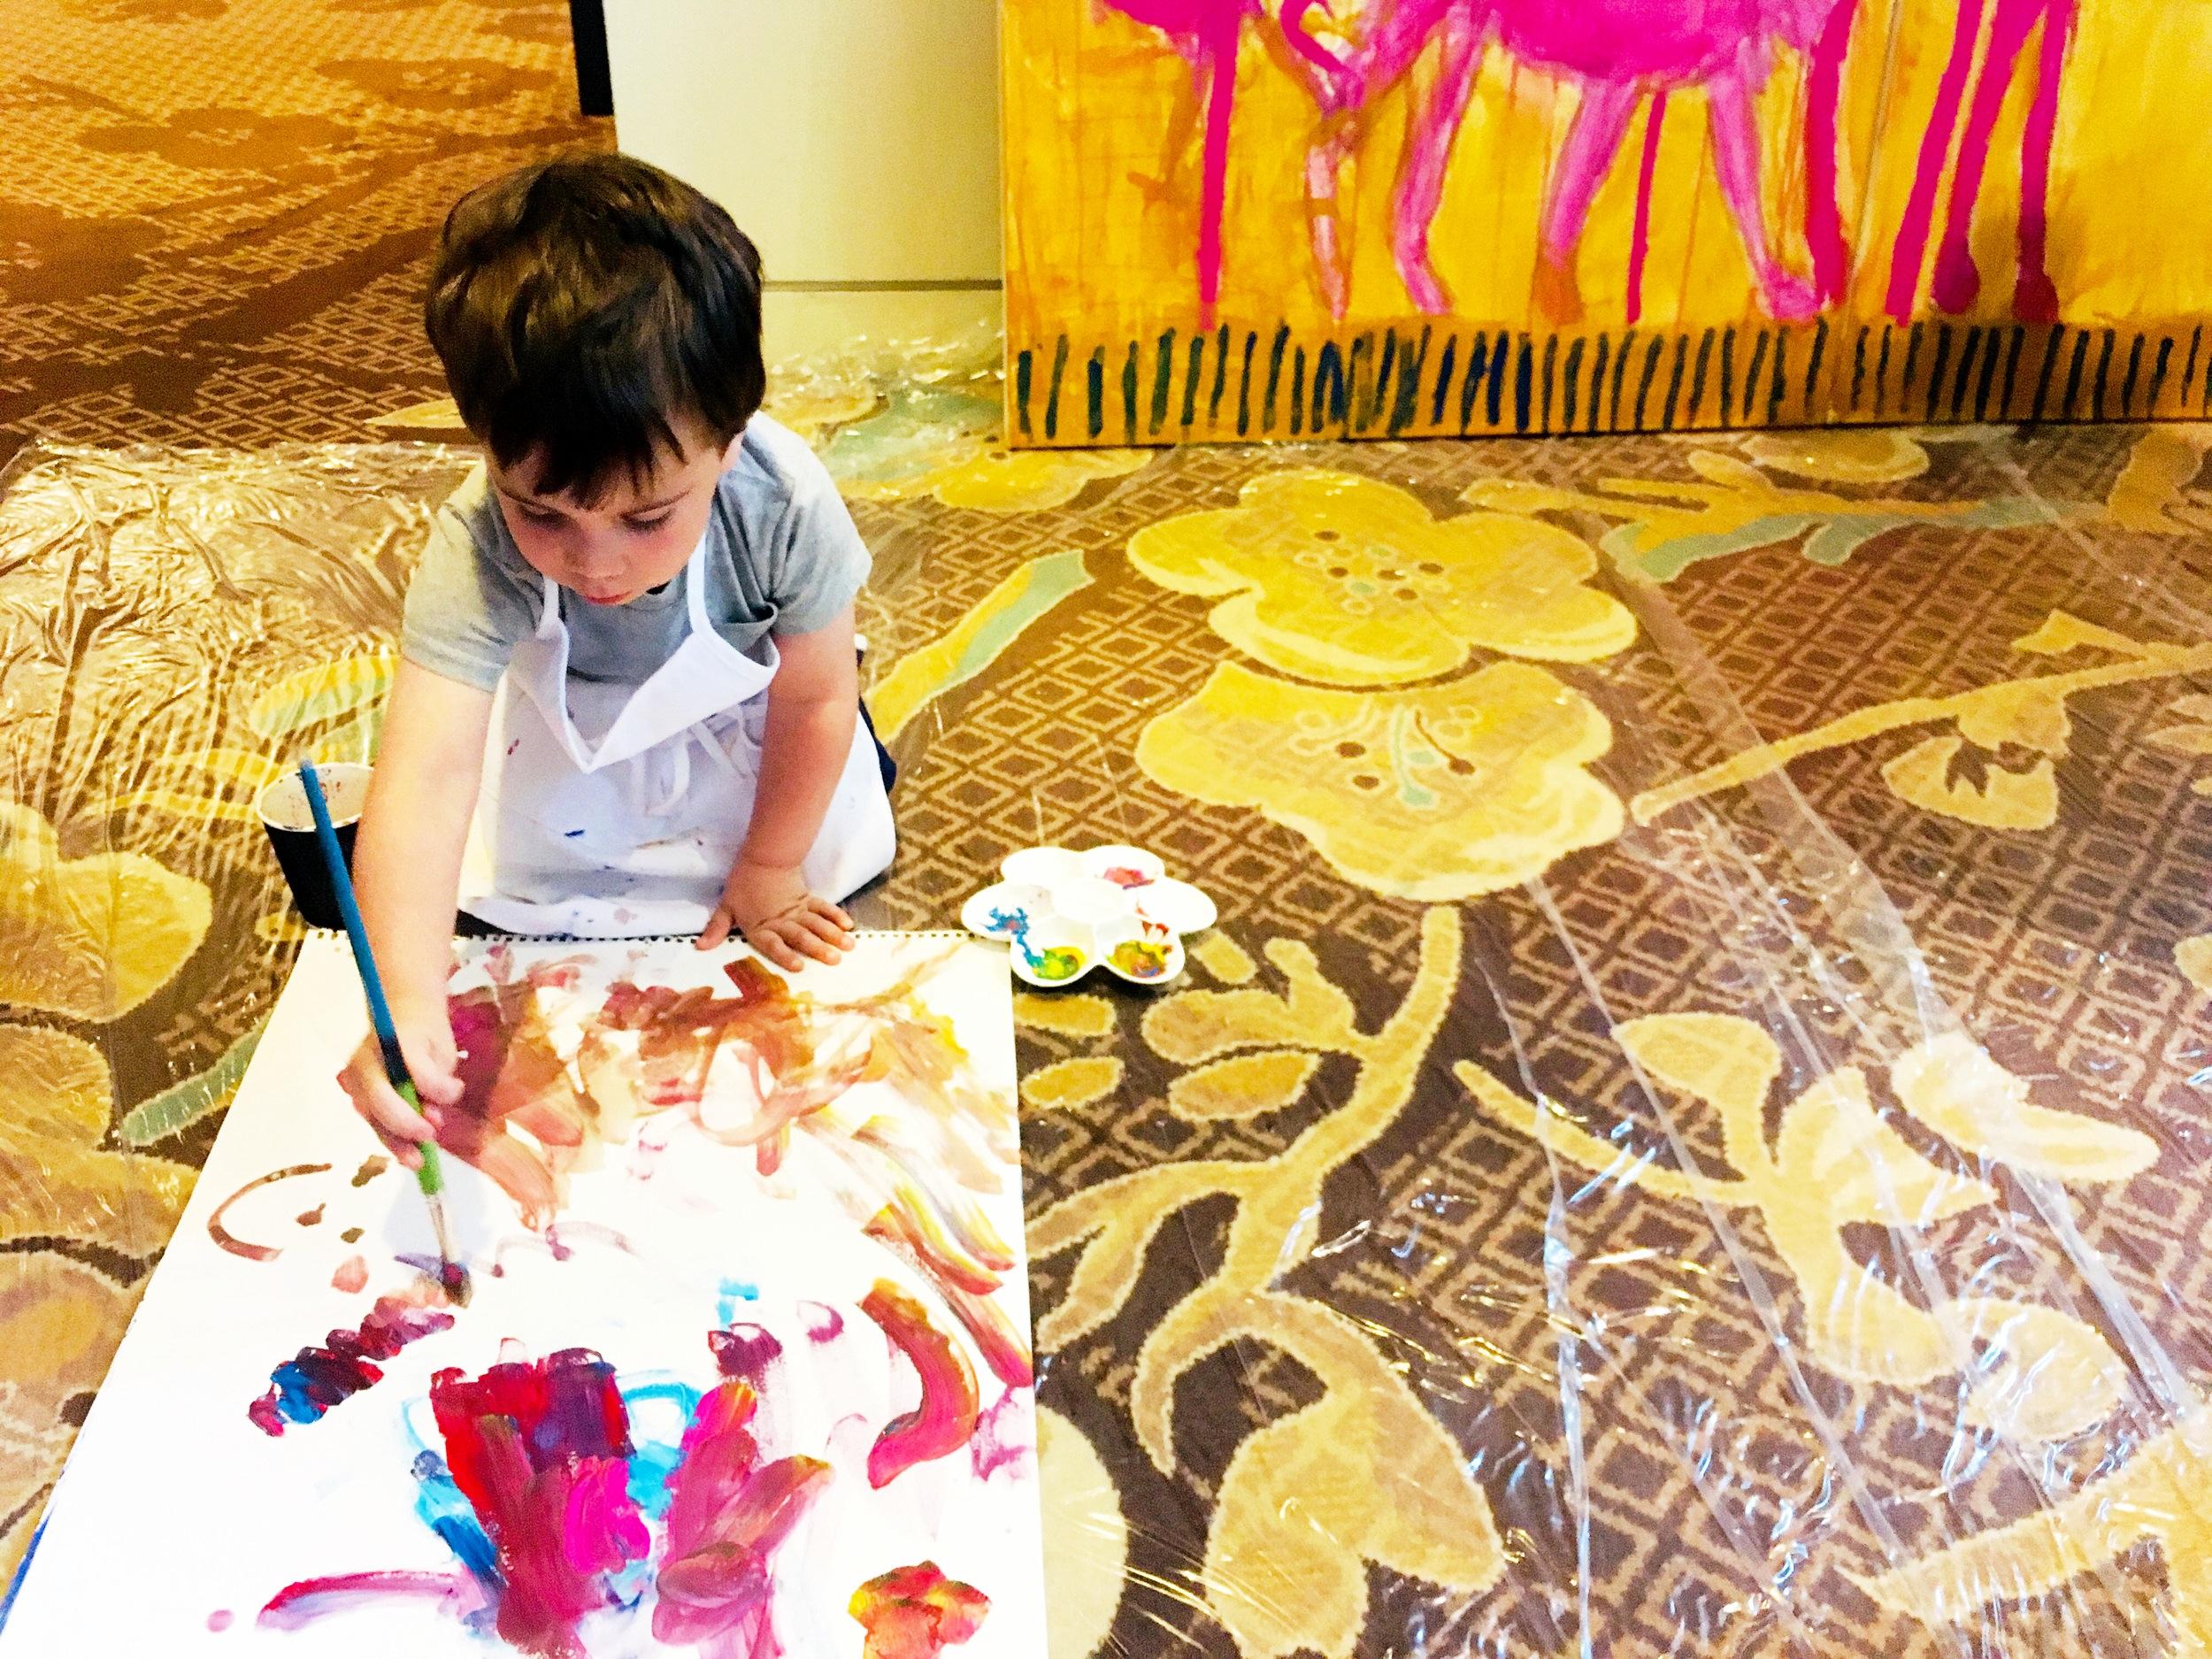 Boy-Painting-FourSeasons-DC-Swirl.JPG